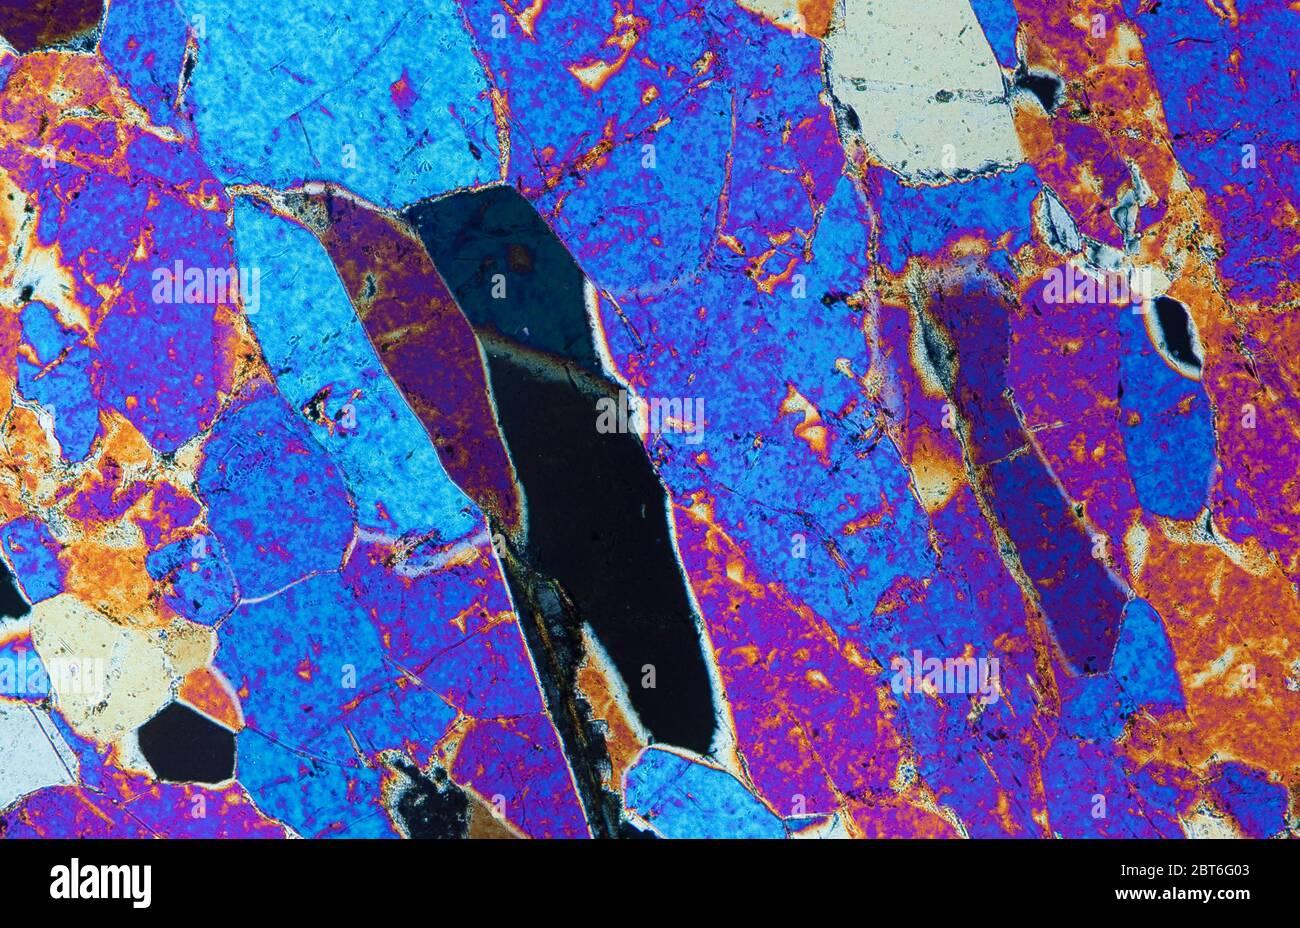 cancrinite-rare-rock-sample-from-the-kol